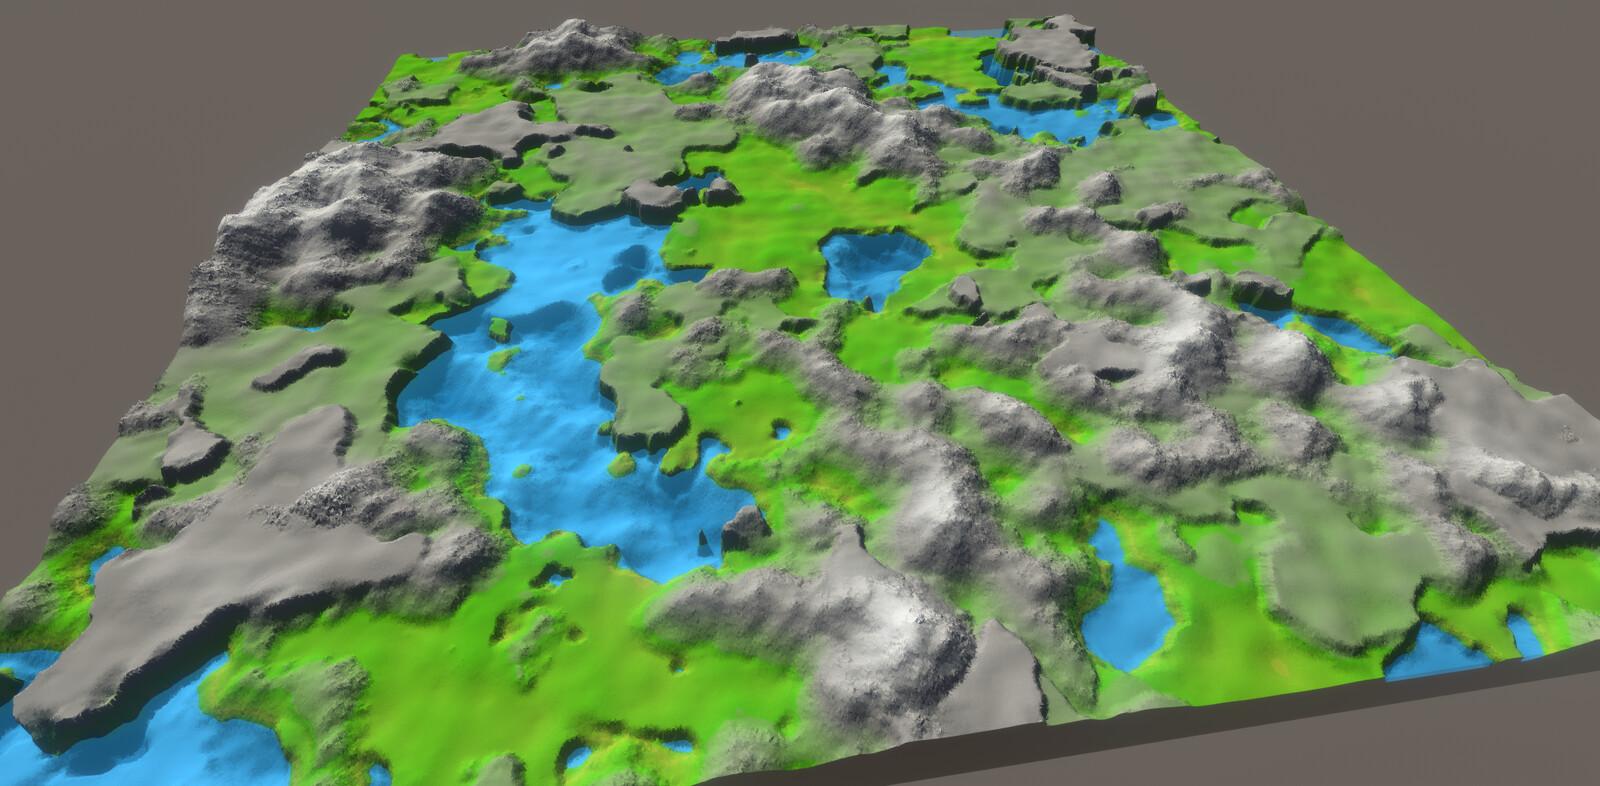 A 5x5 grid of terrain chunks.